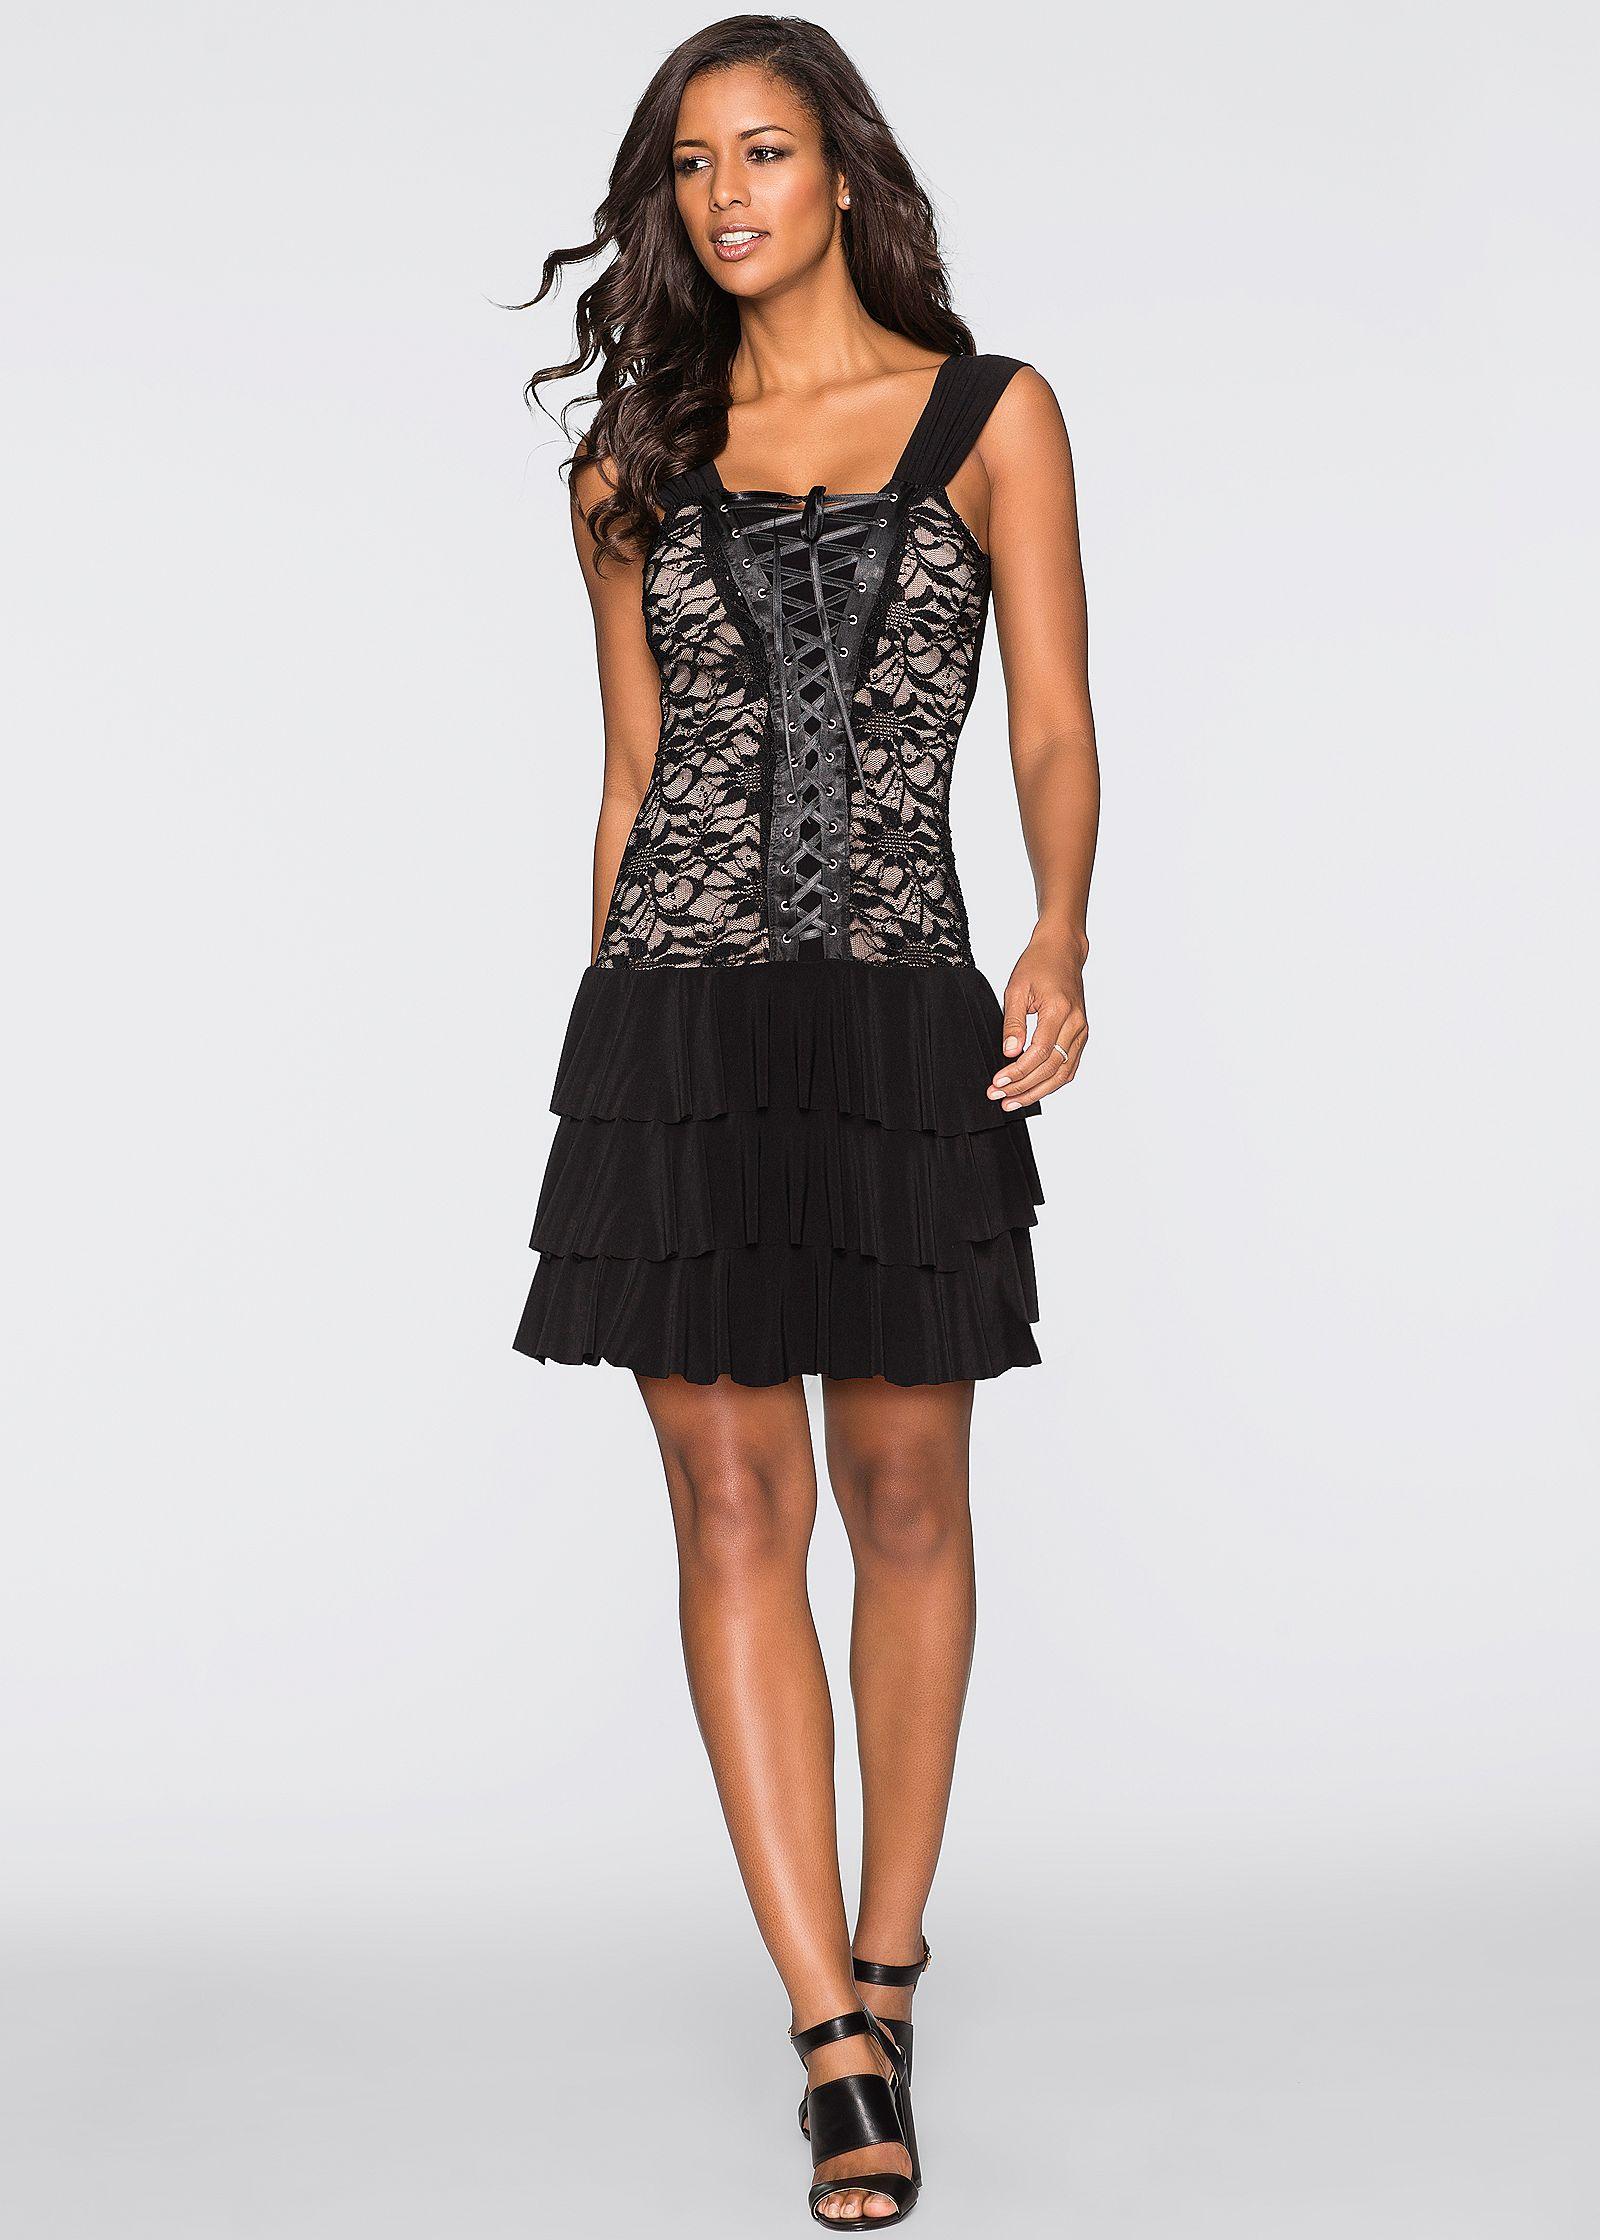 One Strap Black Dresses